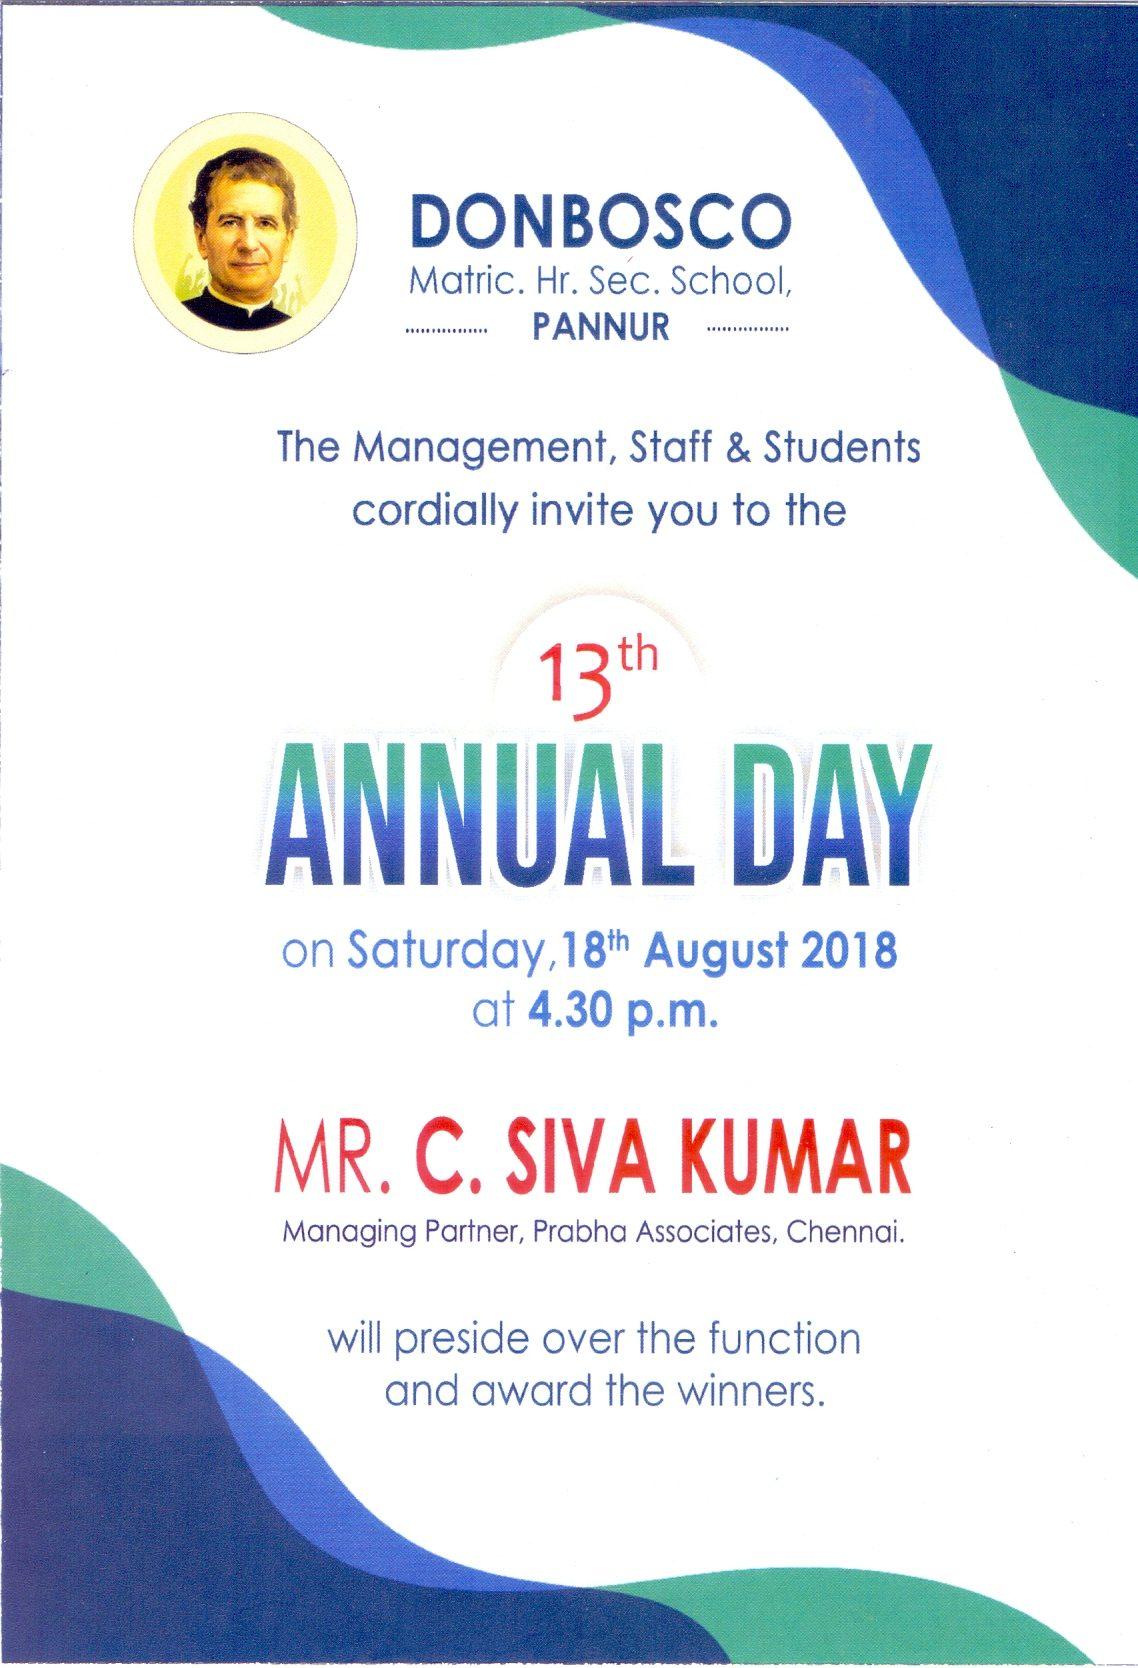 Annual Day Ivitation Card Don Bosco Matric Hr Sec School Pannur